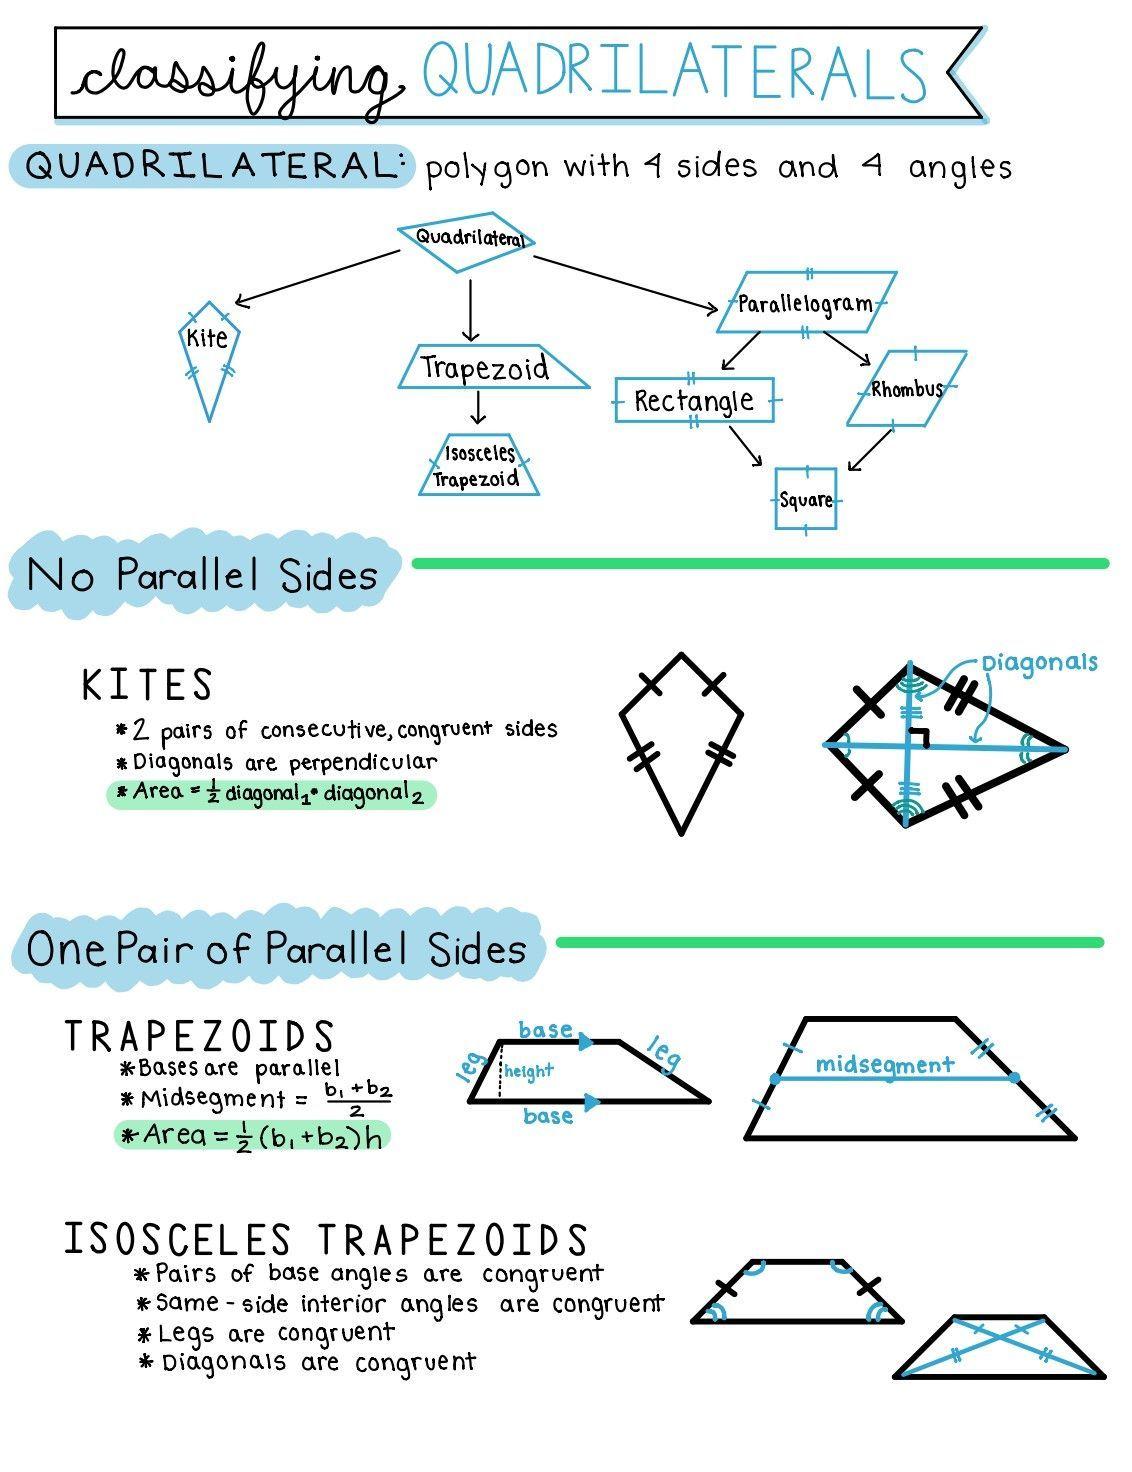 Quadrilaterals Notes In 2020 Quadrilaterals School Organization Notes Classifying Quadrilaterals